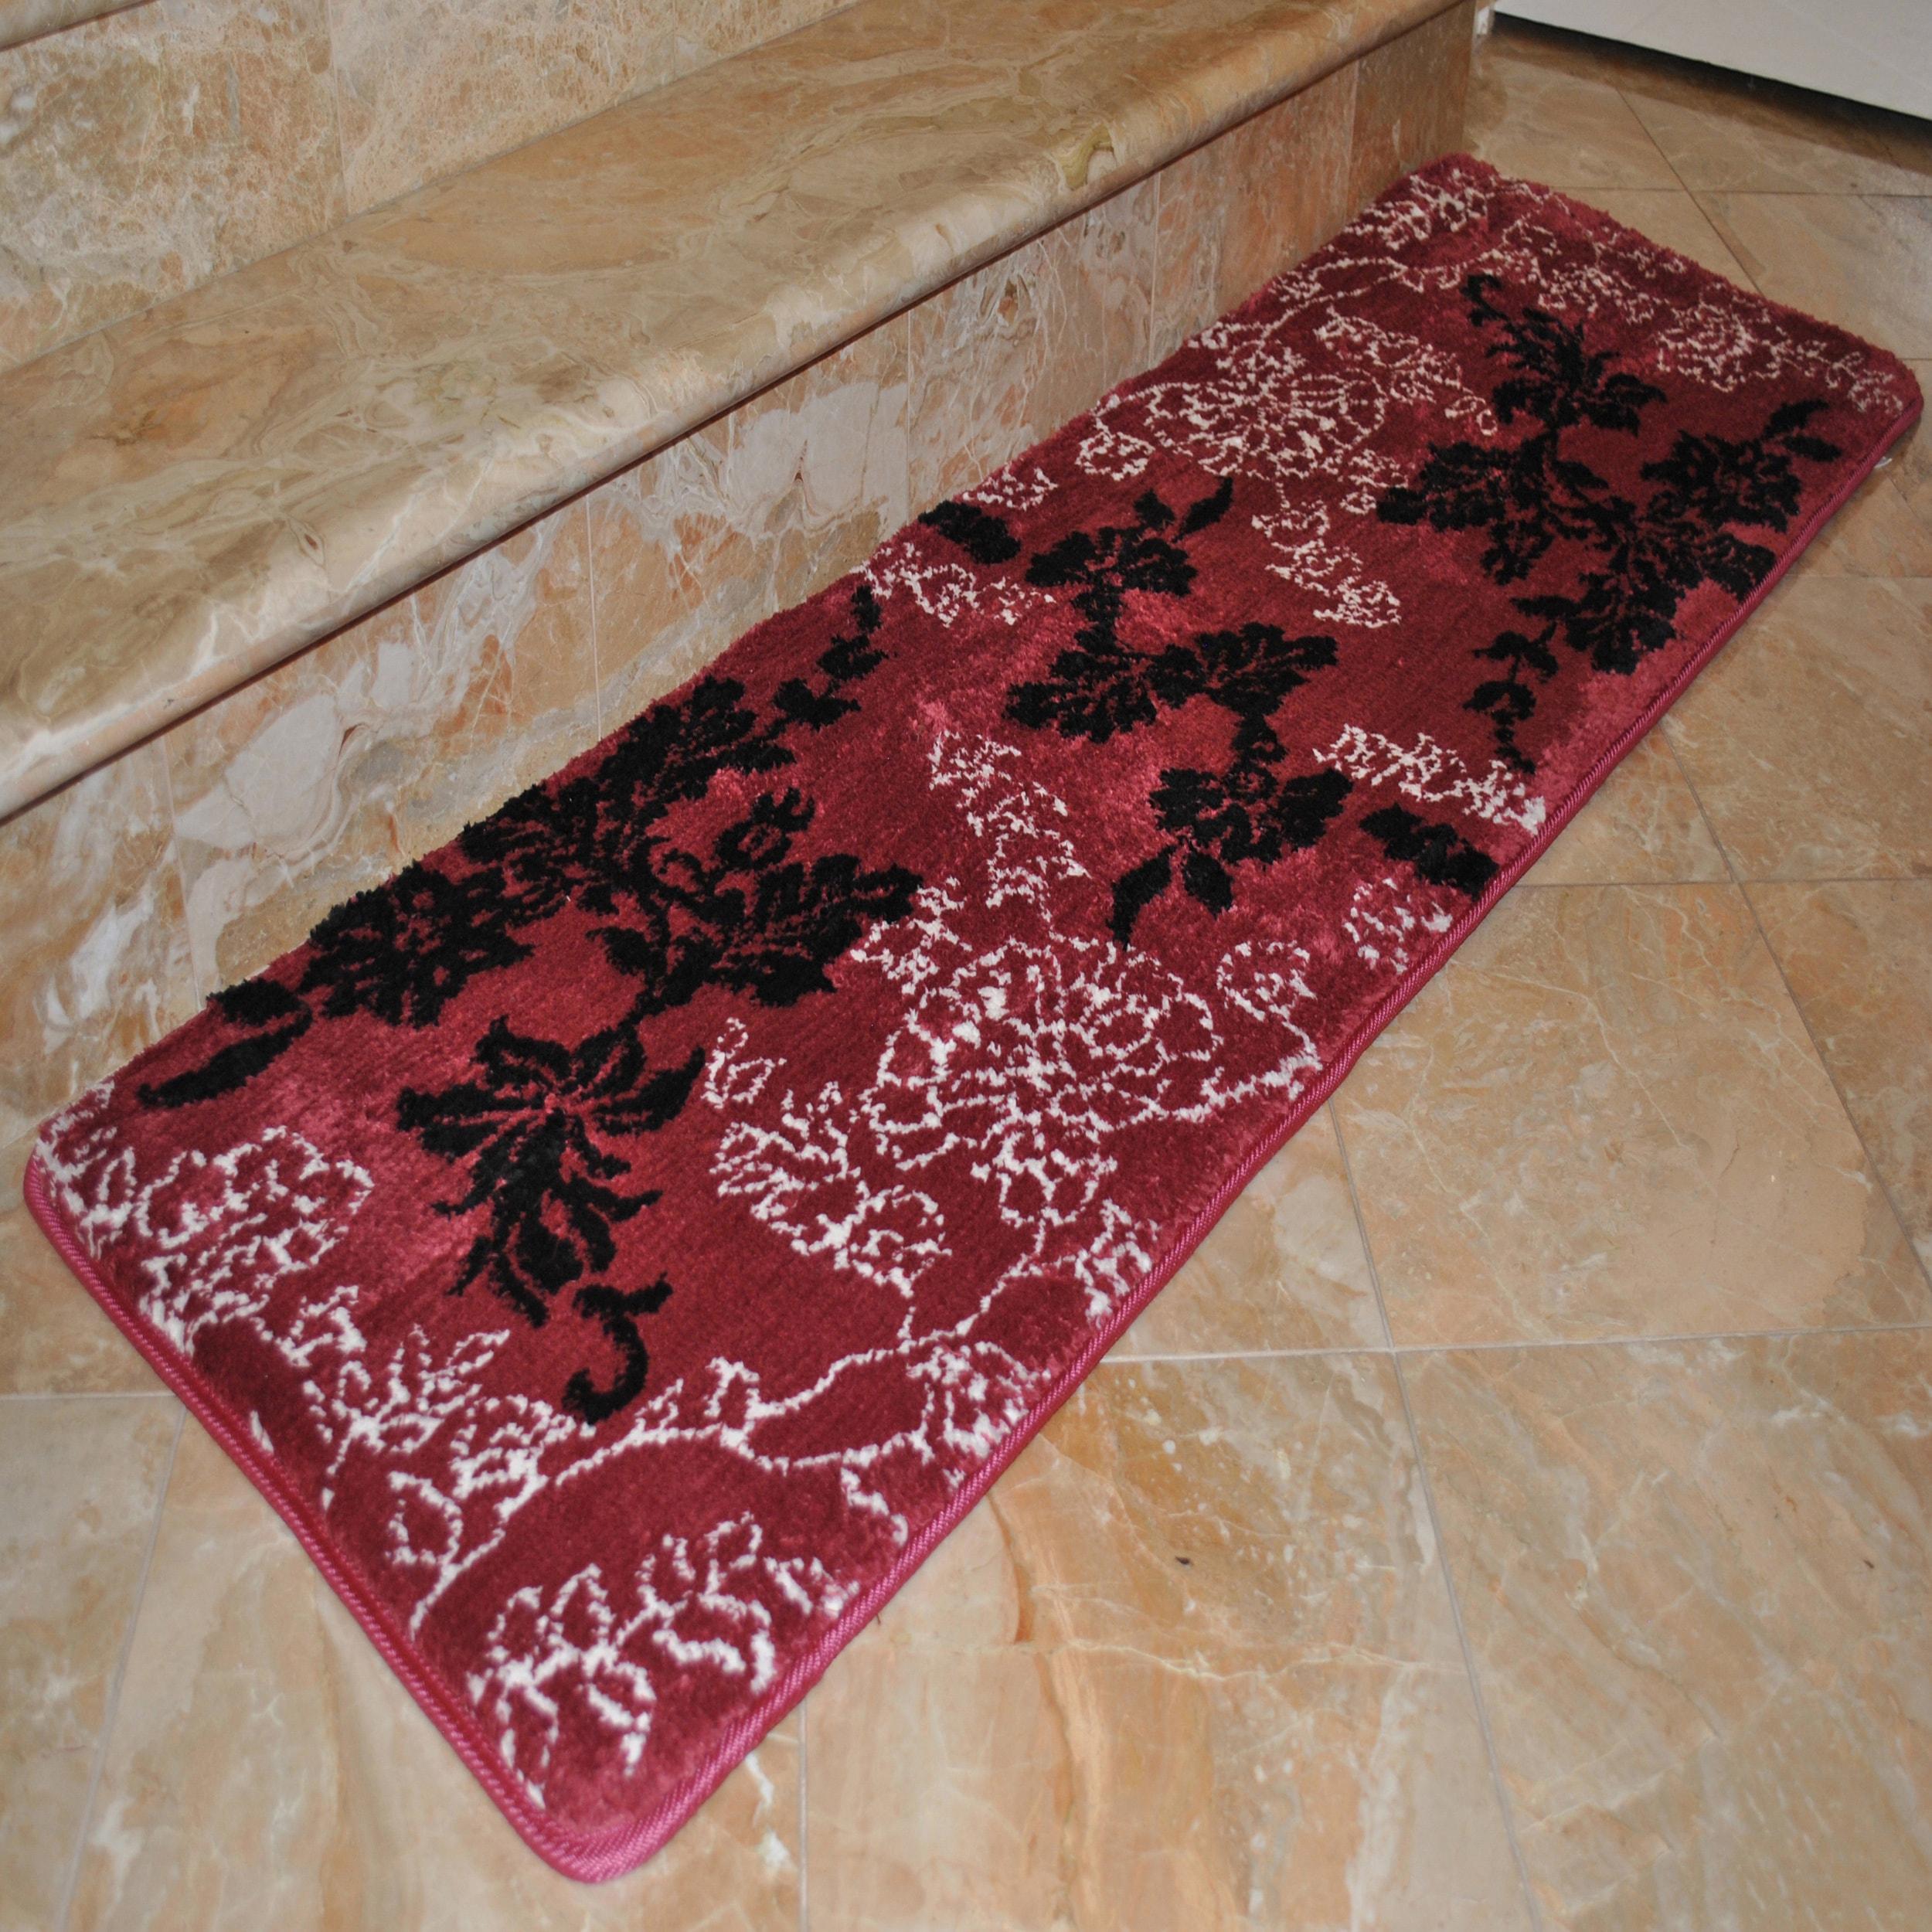 Fashion Street Floral Memory Foam 20 X 64 Bath Runner 1 8 X 5 4